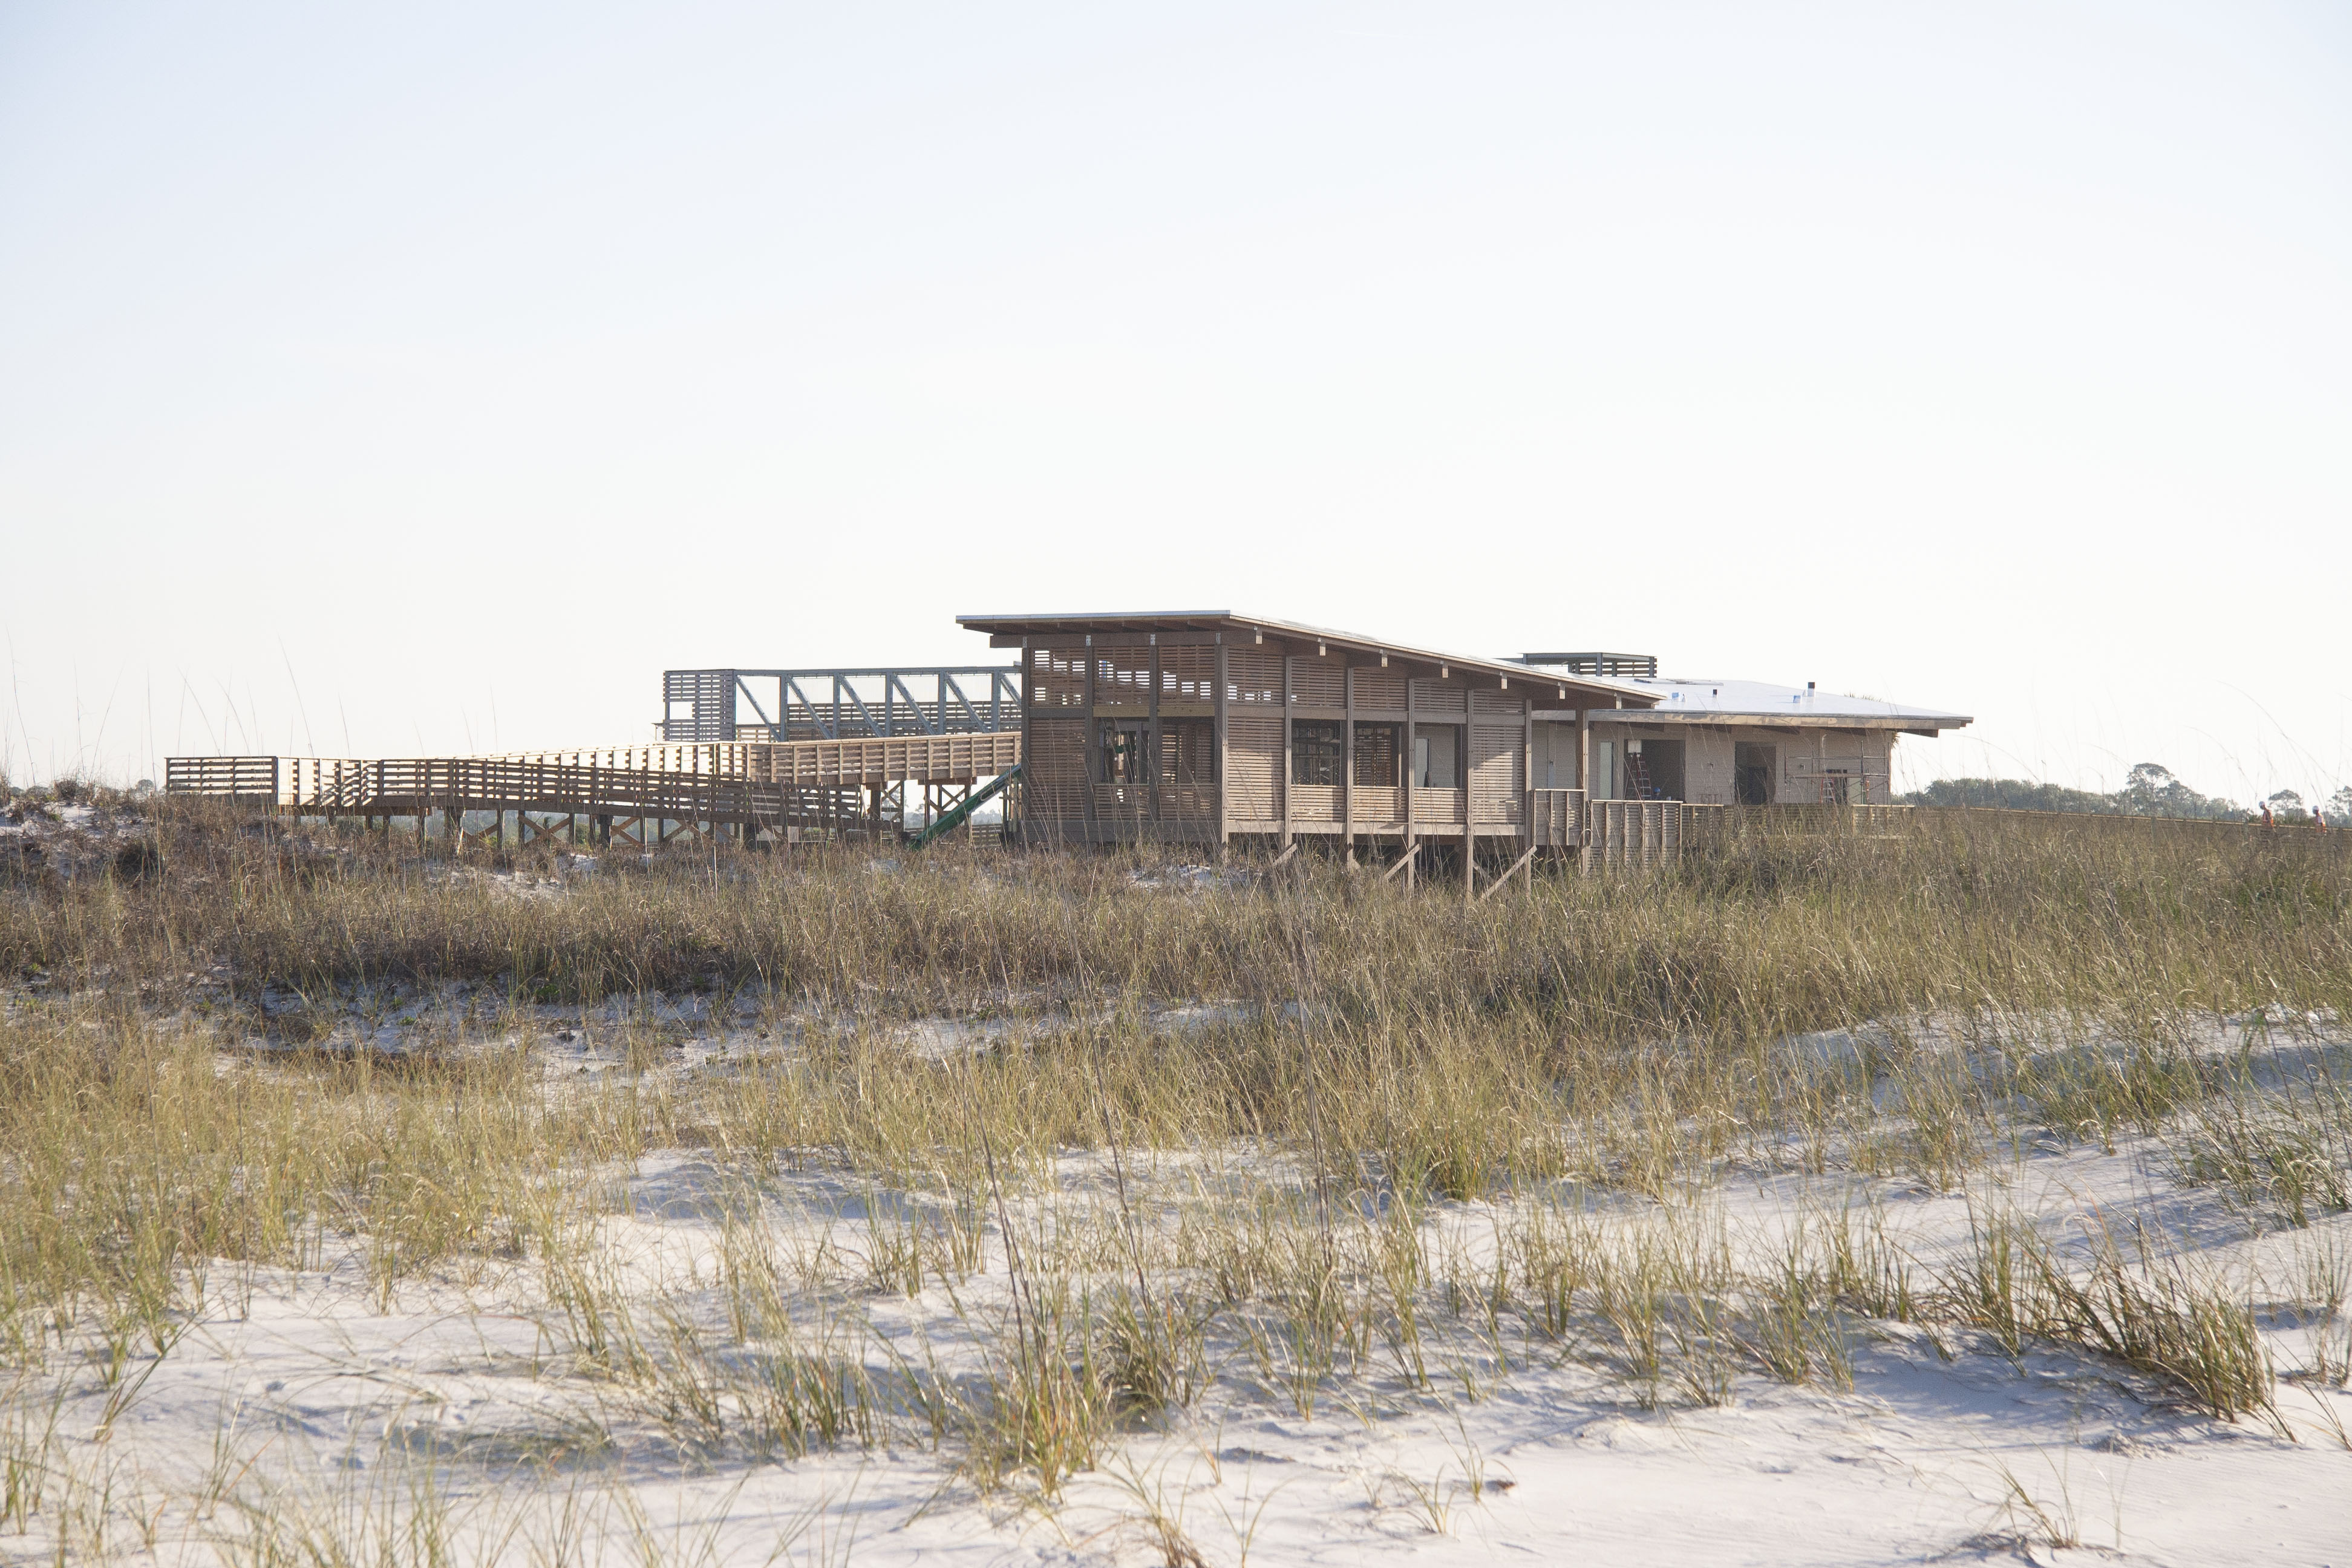 The Gulf State Park Interpretive Center: A Southern Success